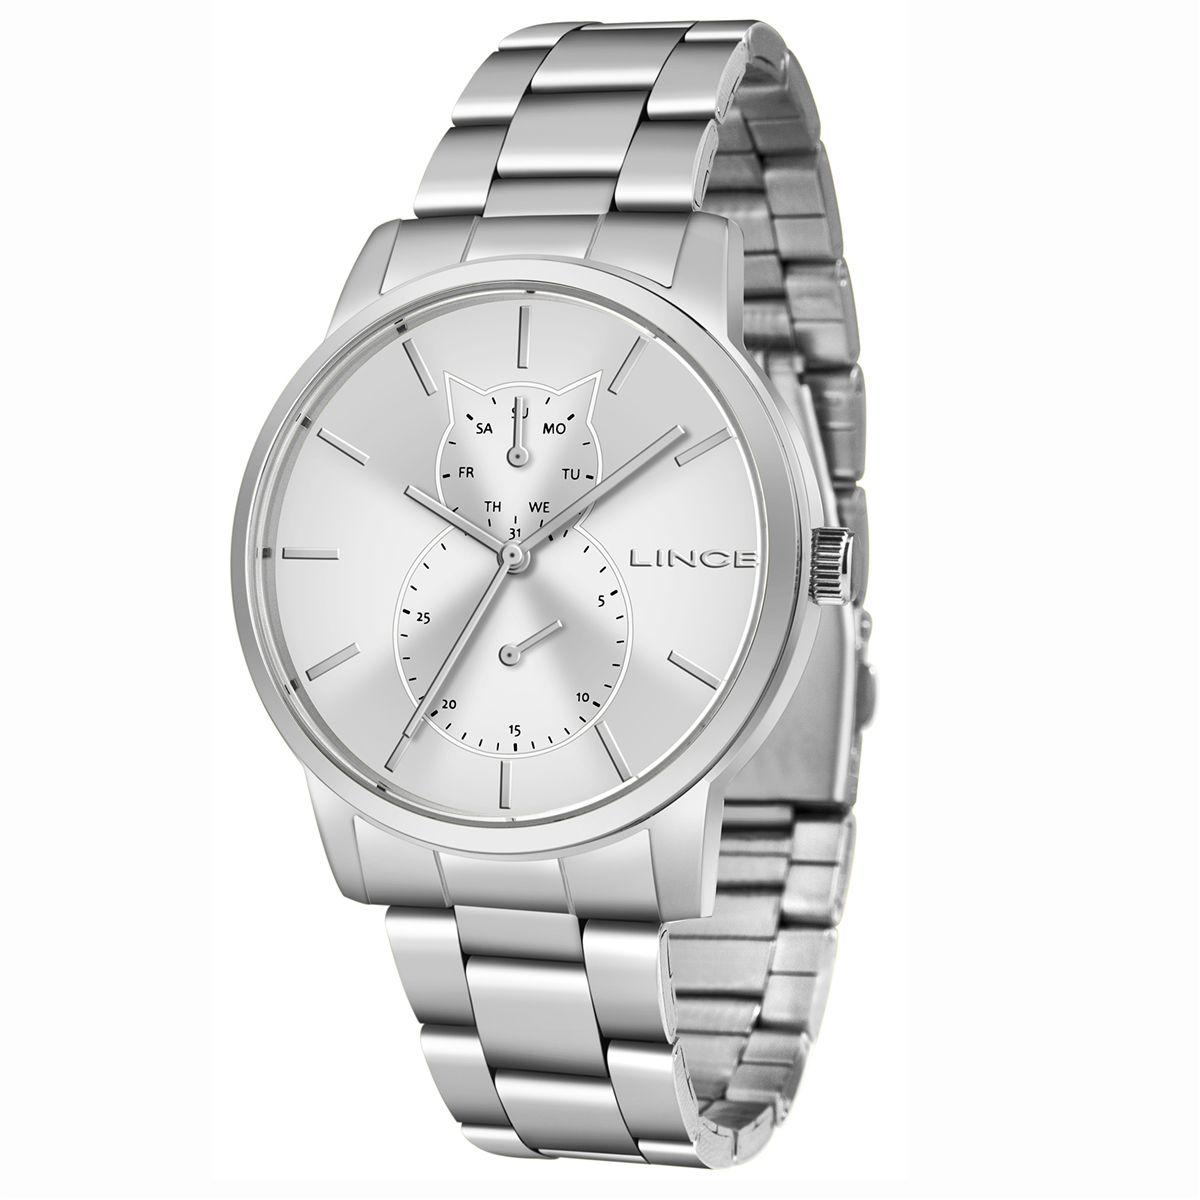 Relógio Feminino Lince Urban LMMJ086L-S1SX